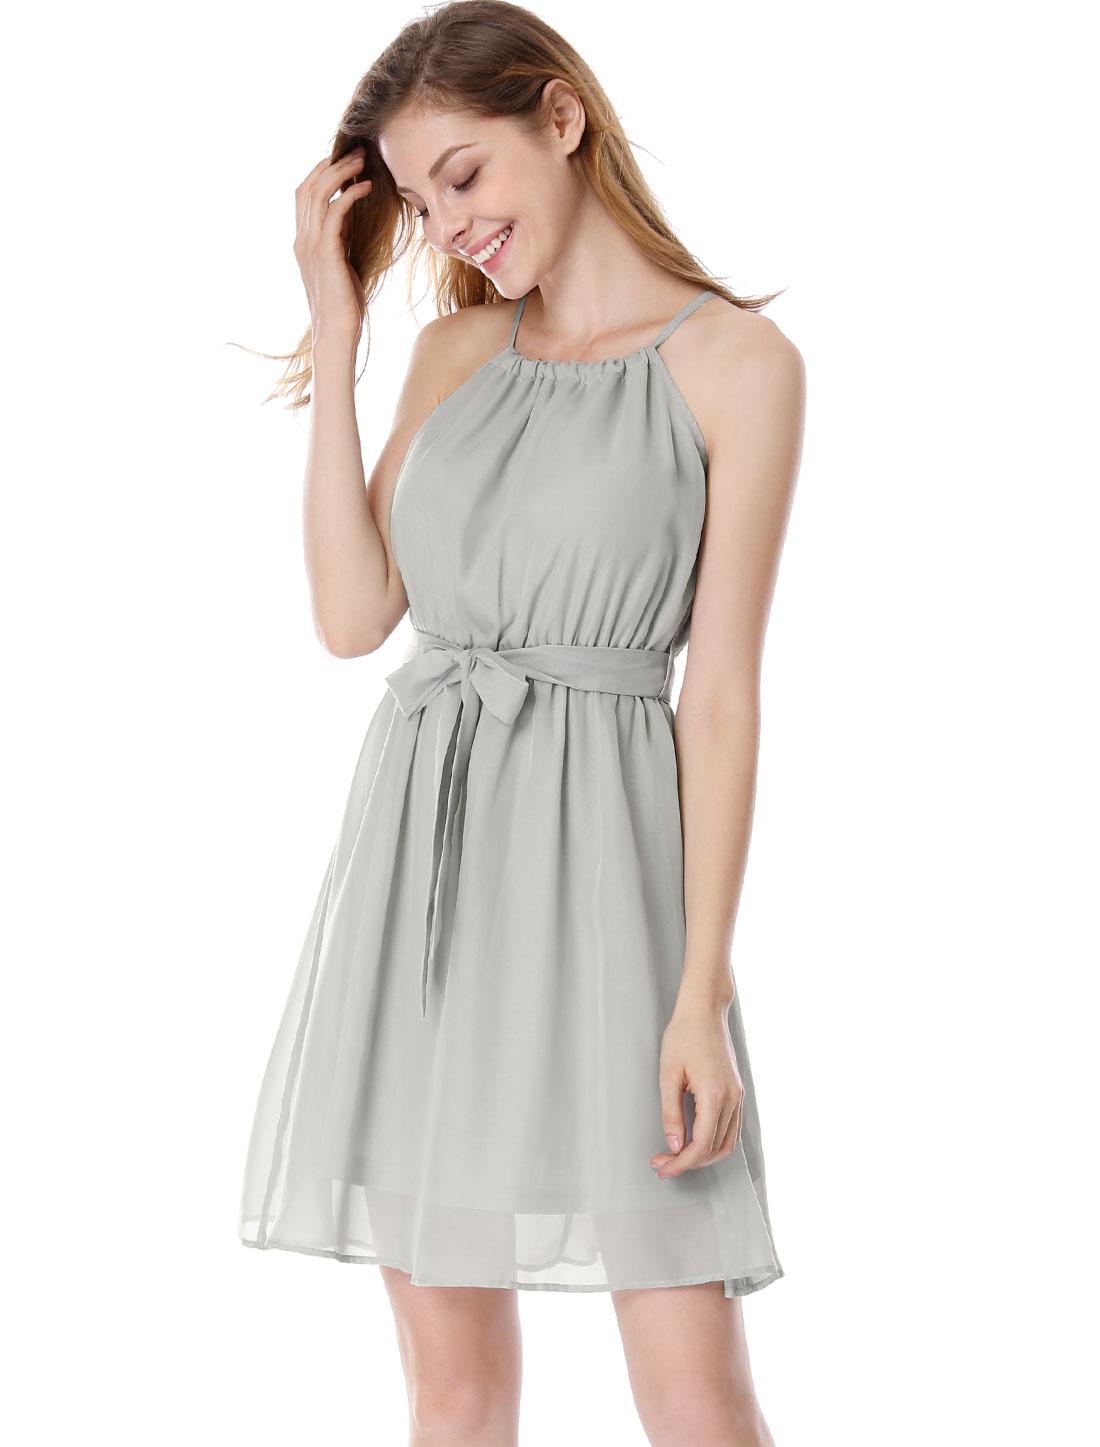 Ladies Chic Halter Neck Sleeveless Light Gray Dress w Waist Strap S